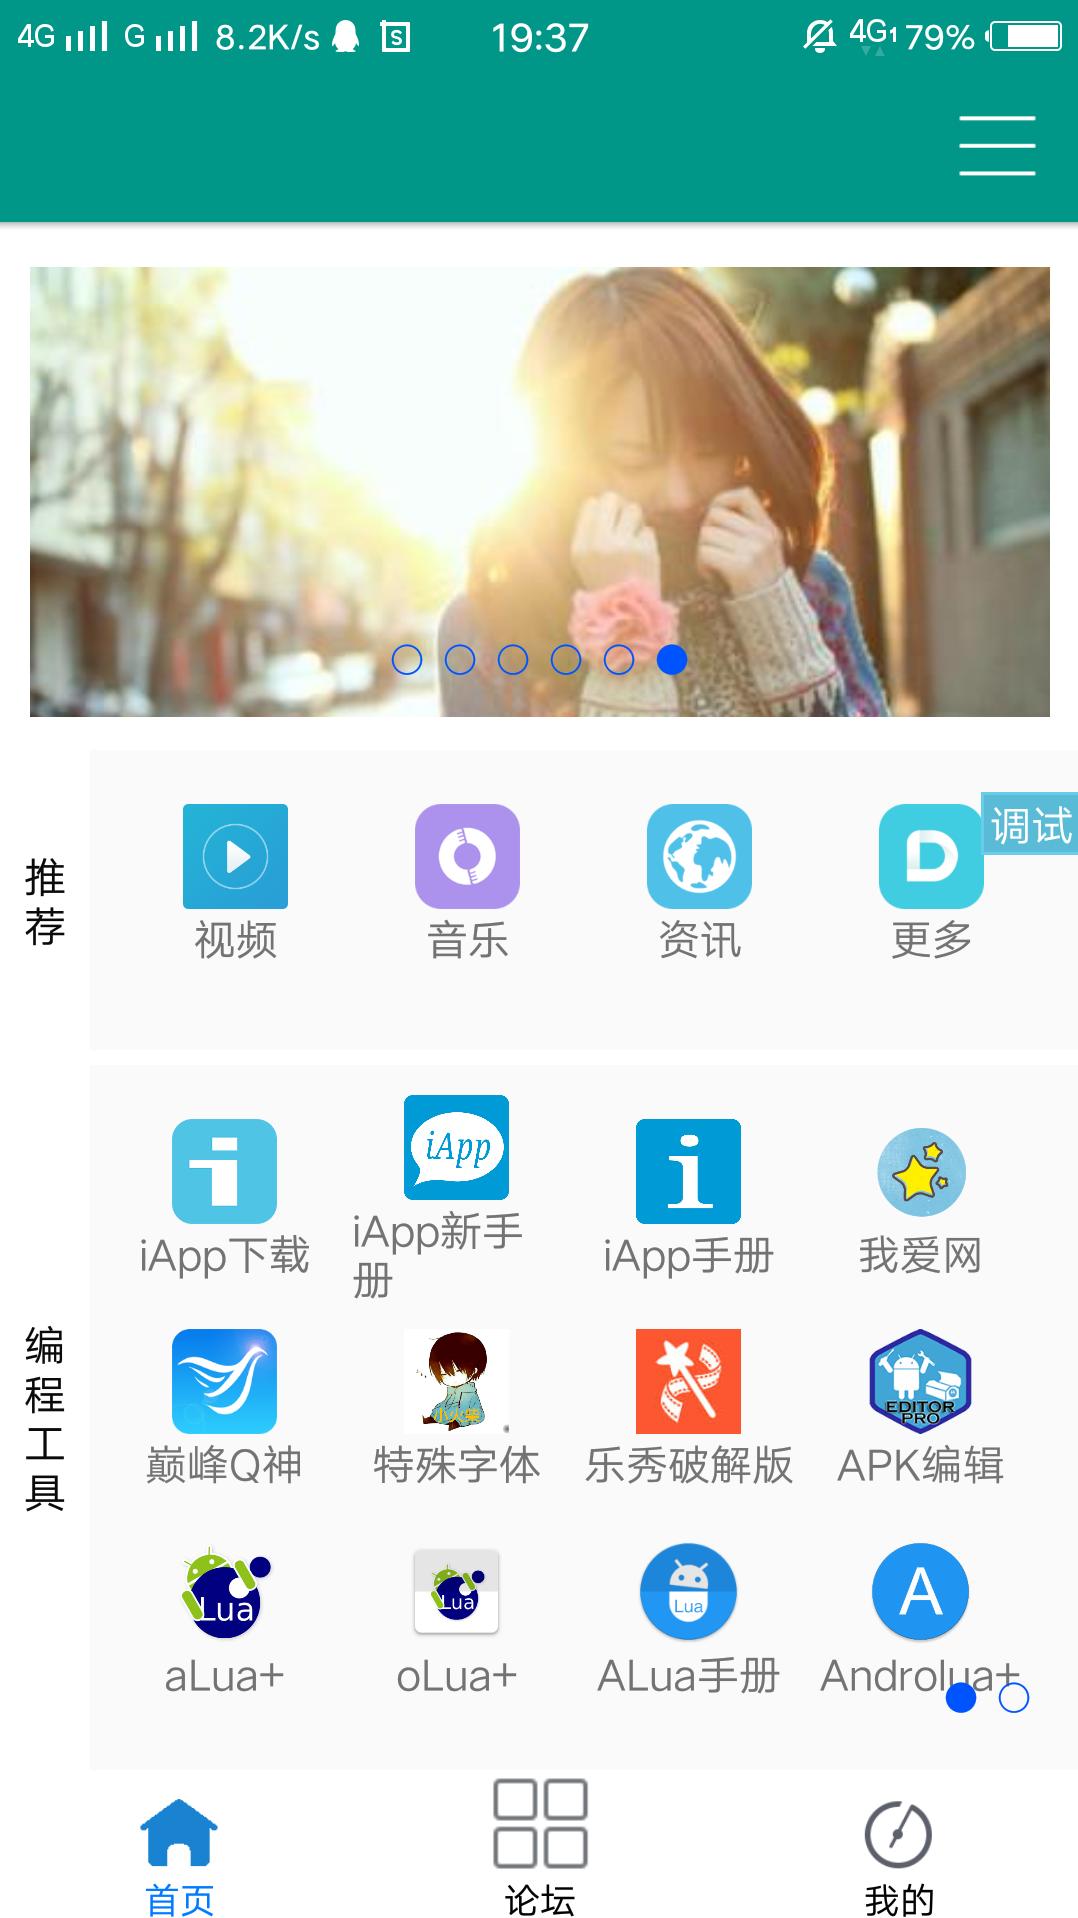 【iapp源码】Aicm开源UI布局